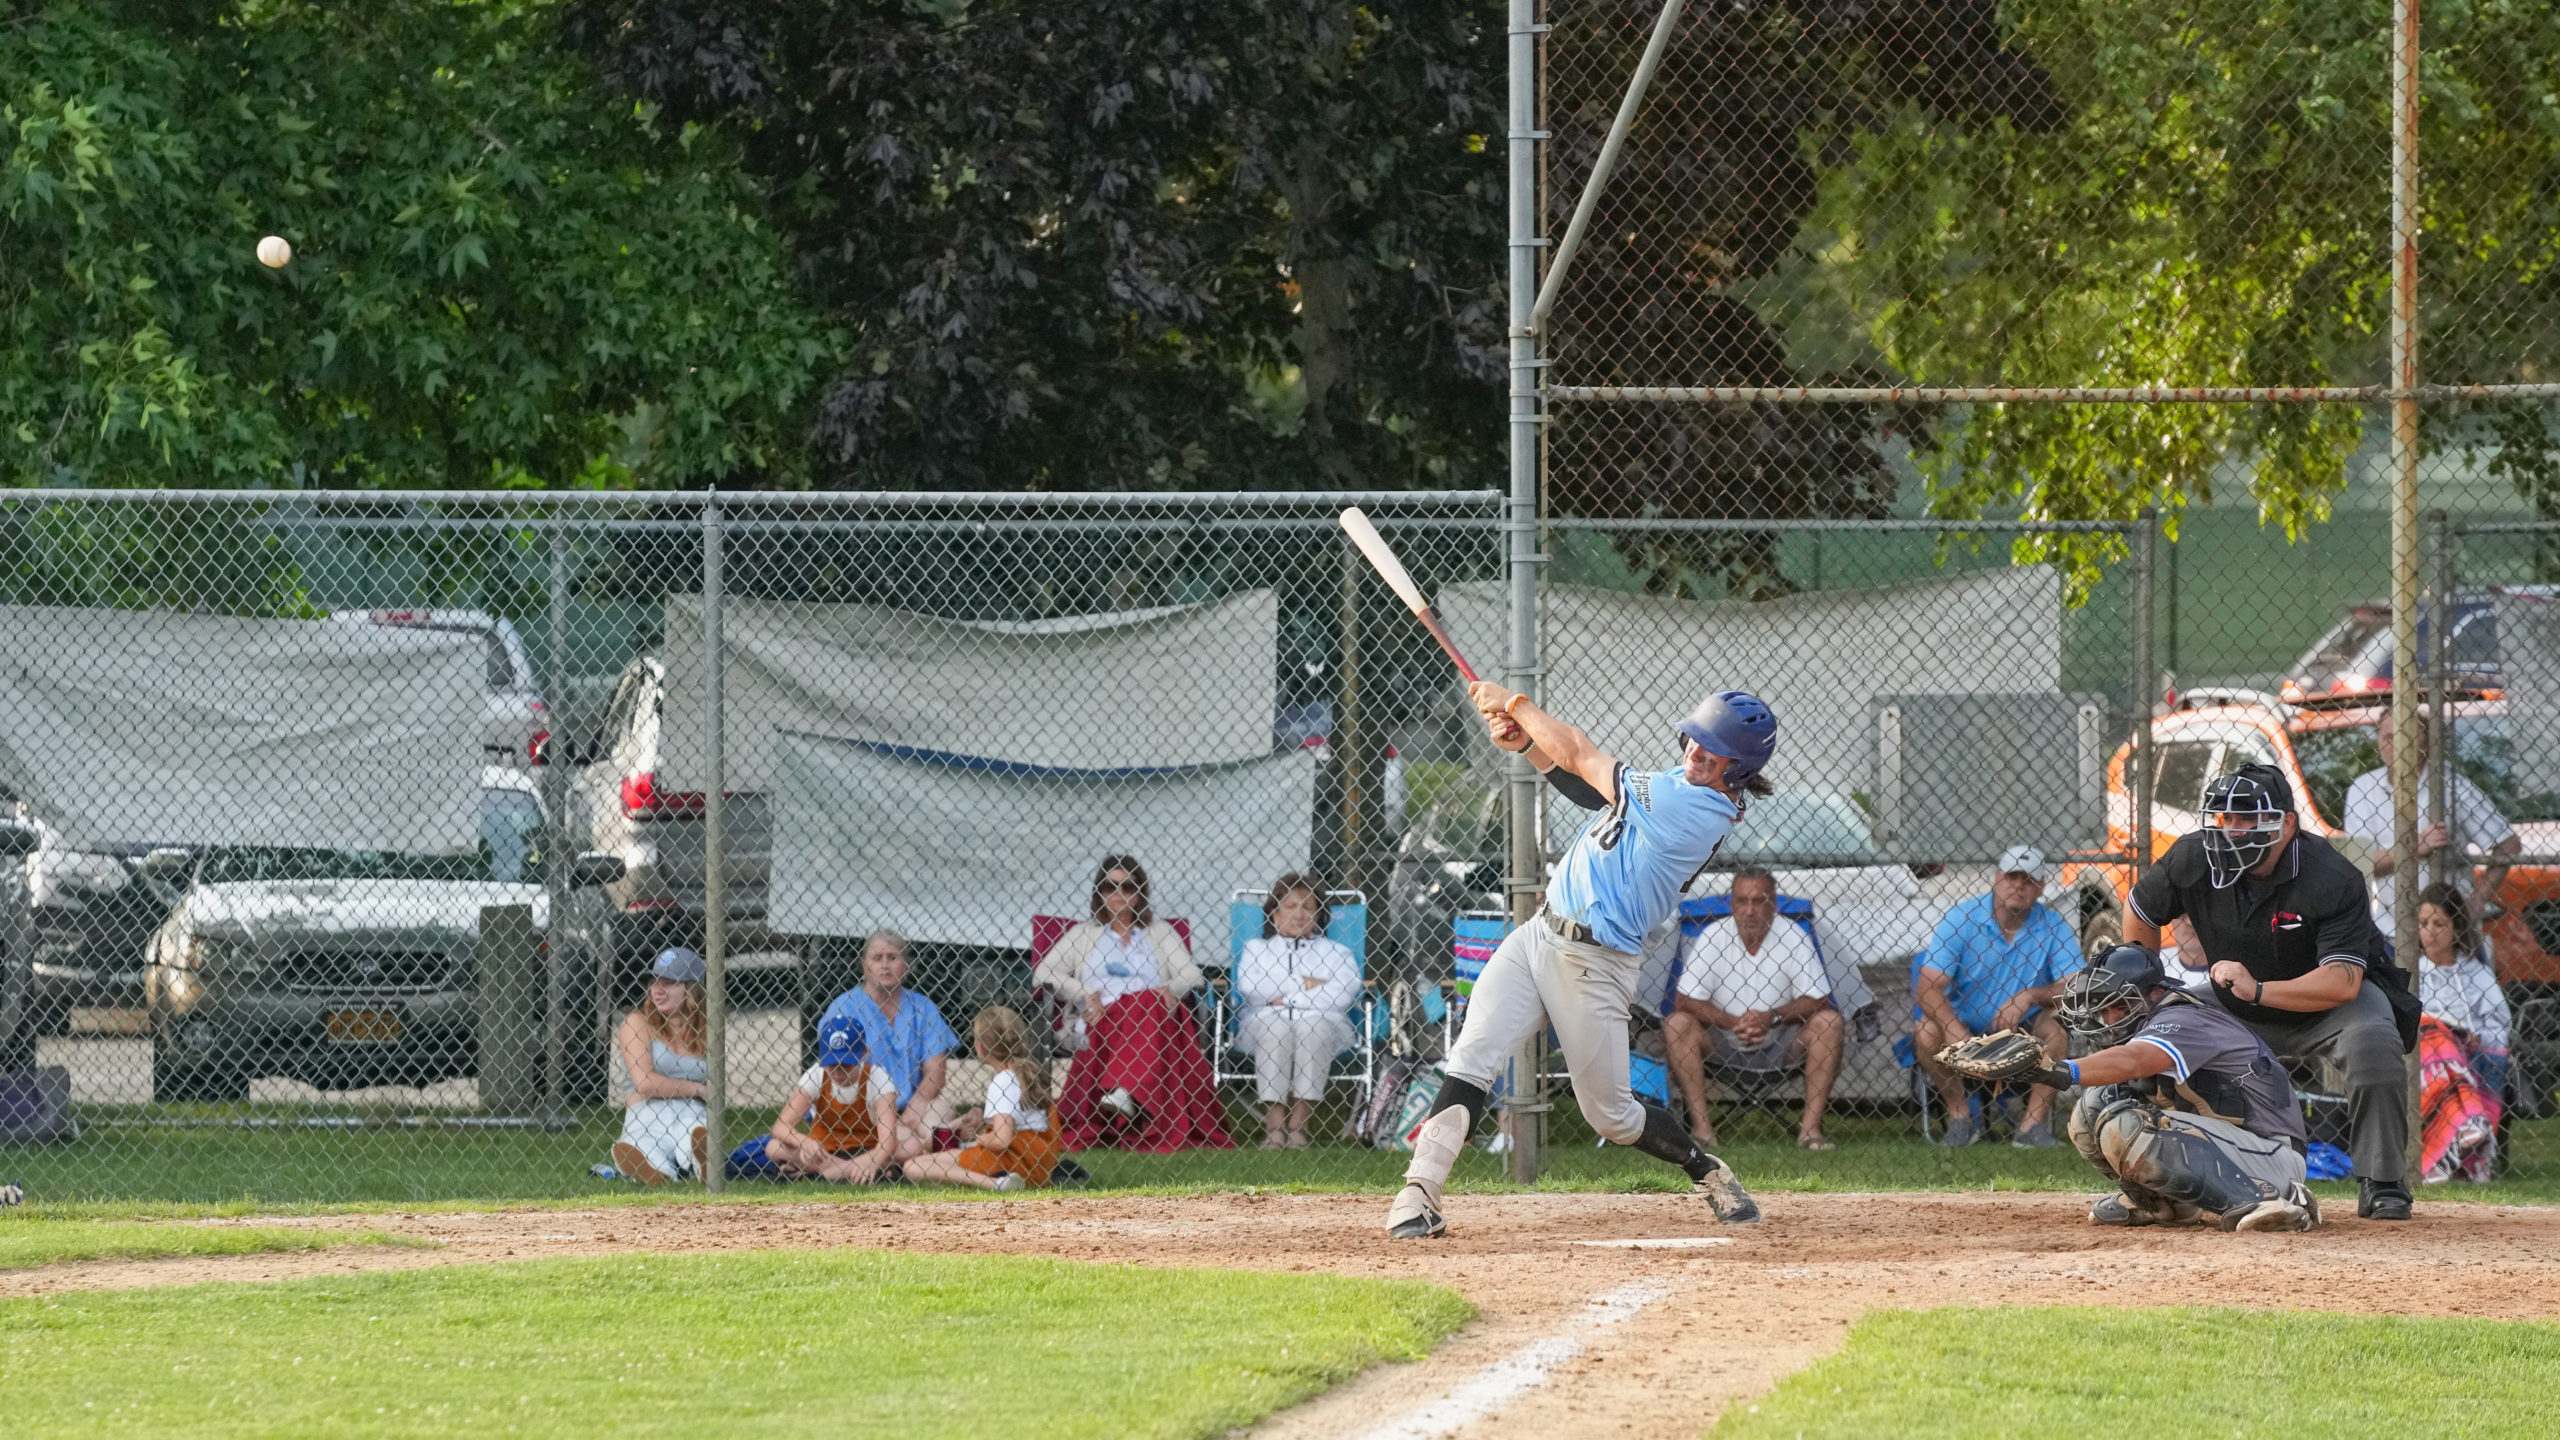 Sag Harbor's Sean Springer (Cincinnati) makes contact with a pitch.